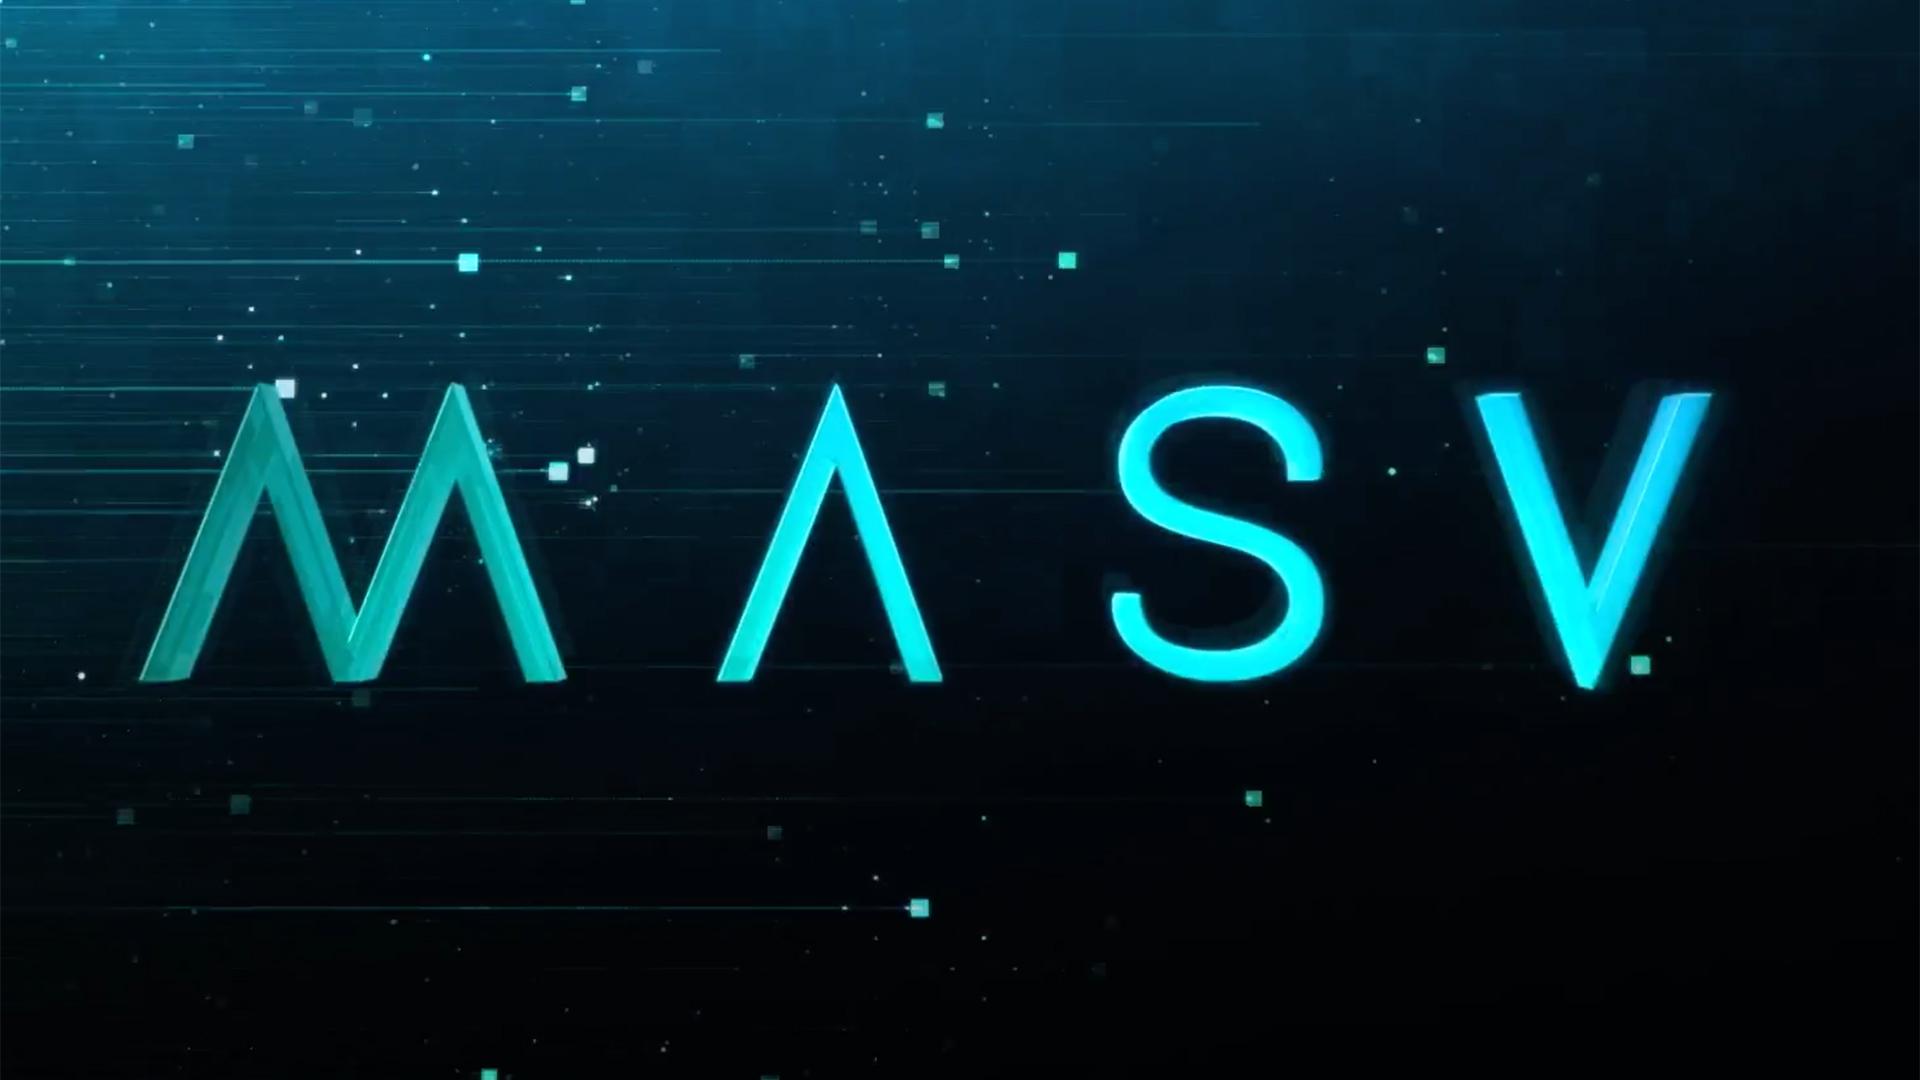 MASV 3レビュー - 大容量ファイル転送サービス